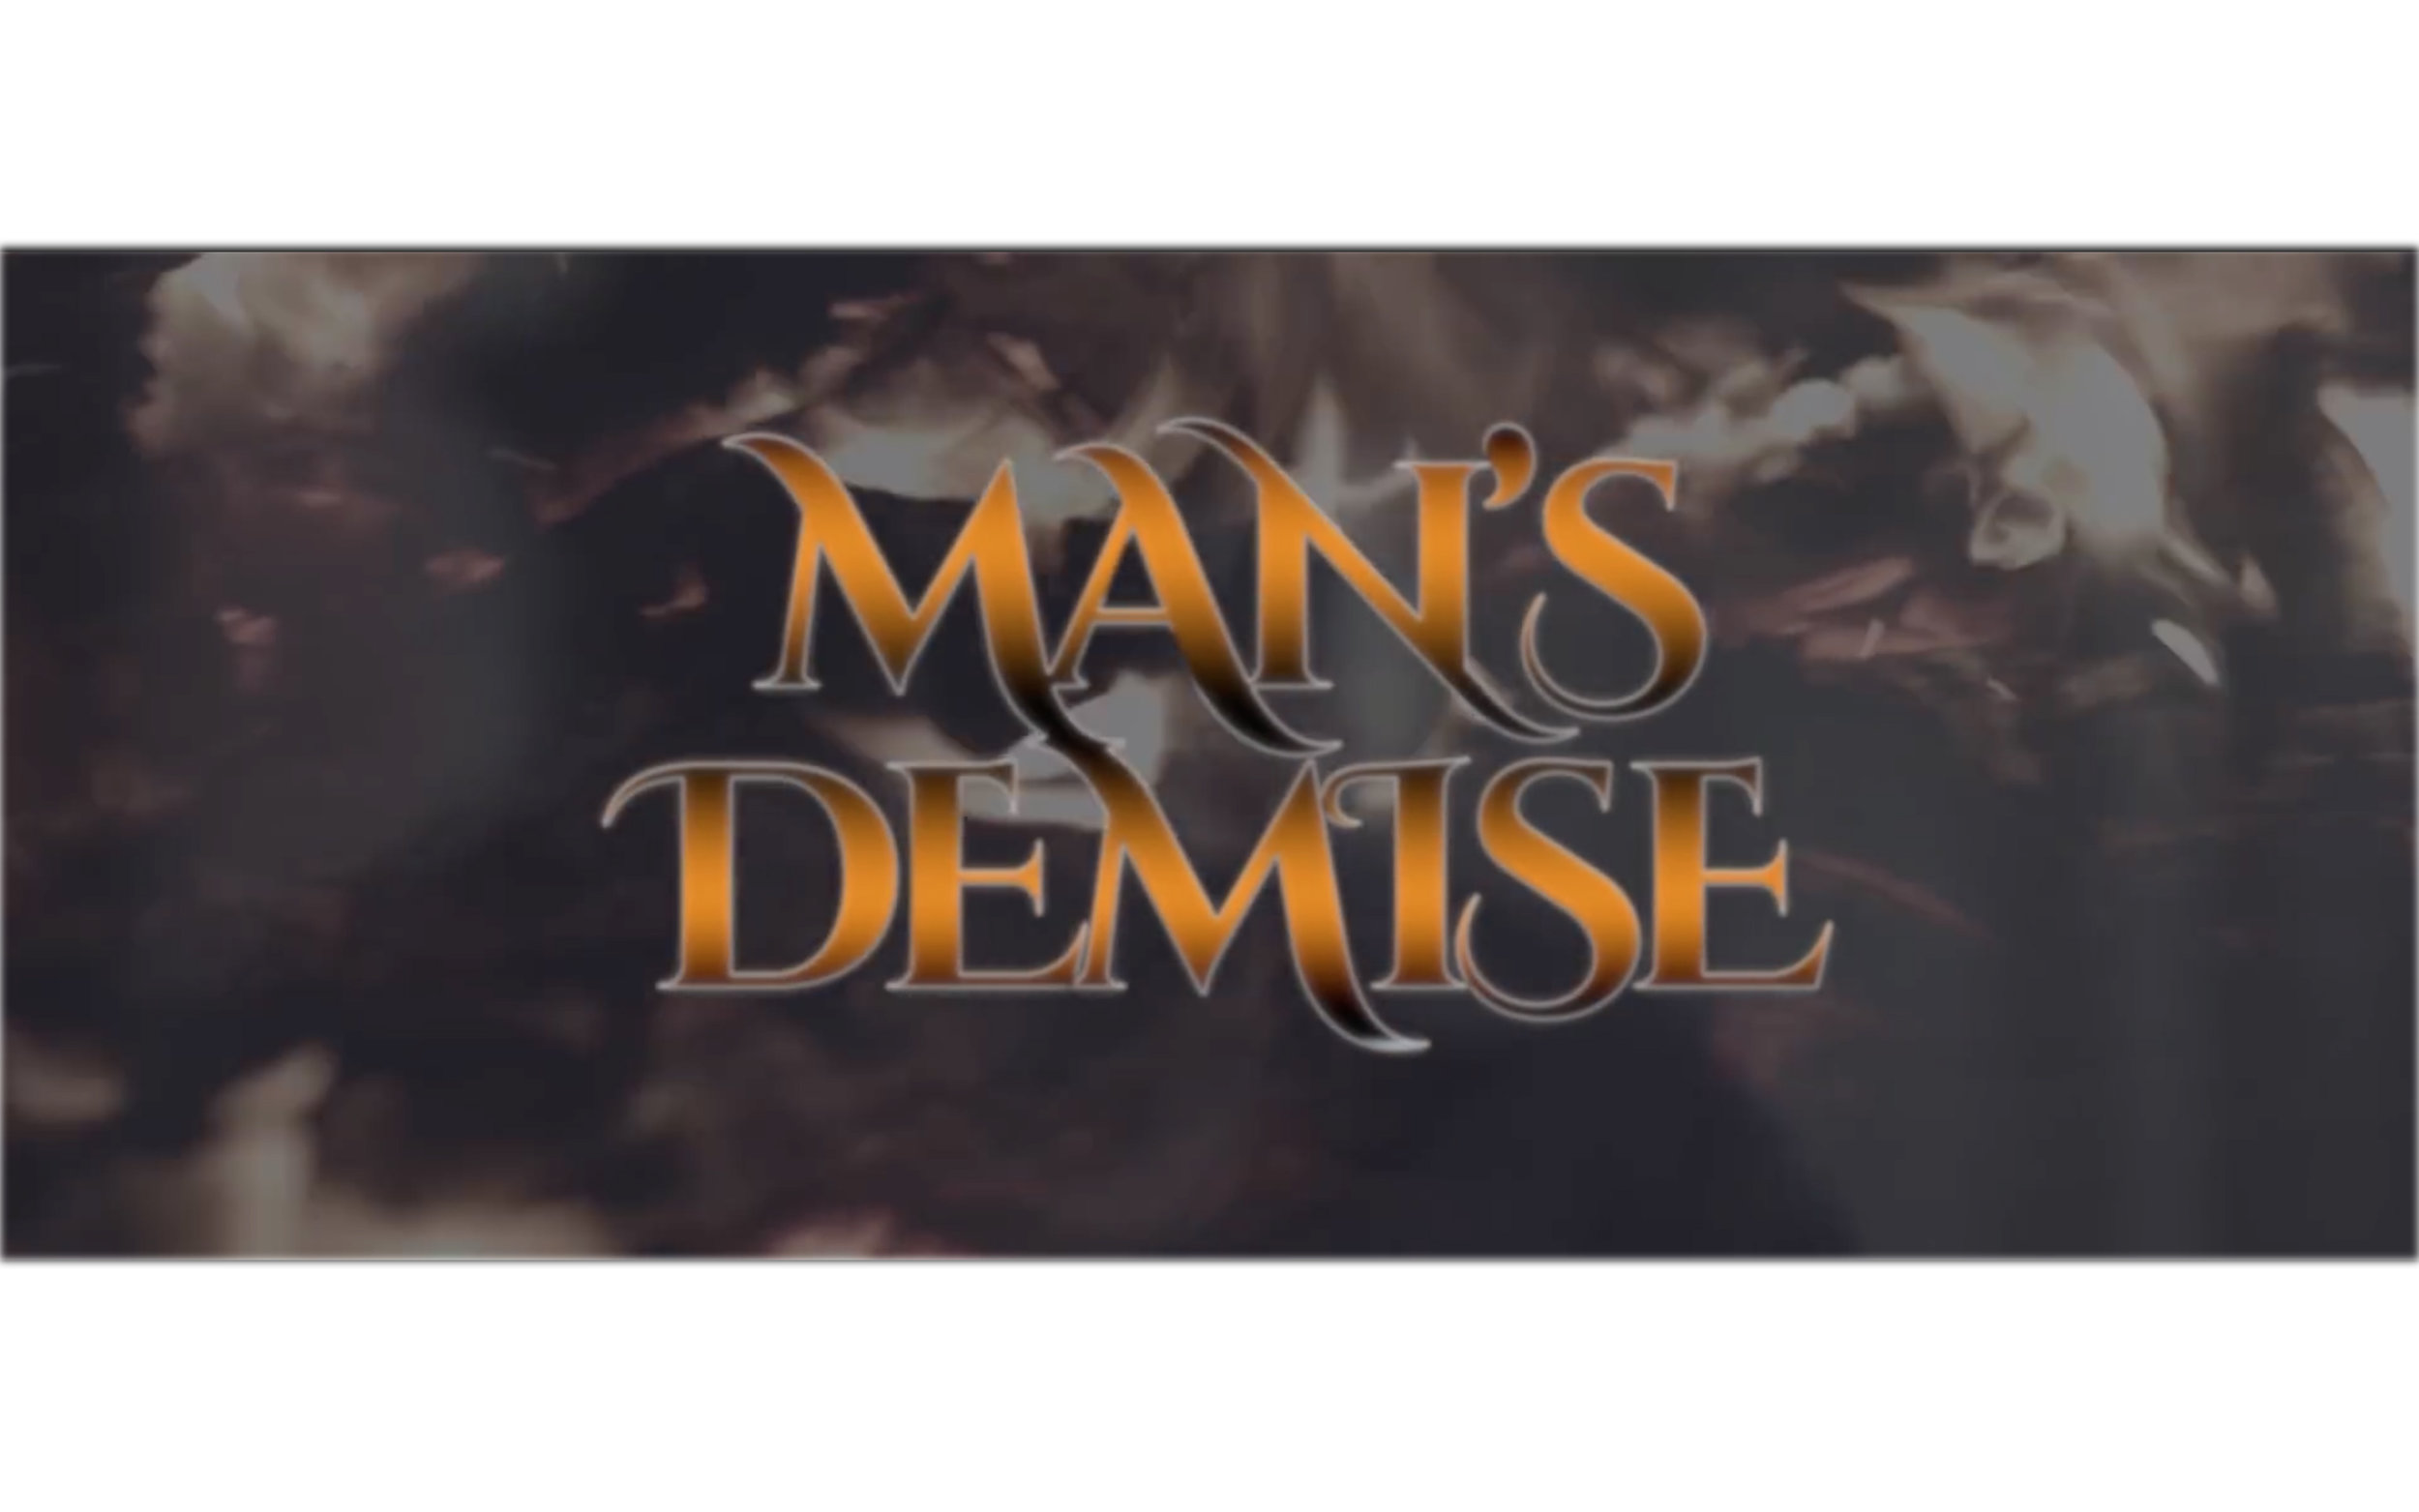 Man's Demise